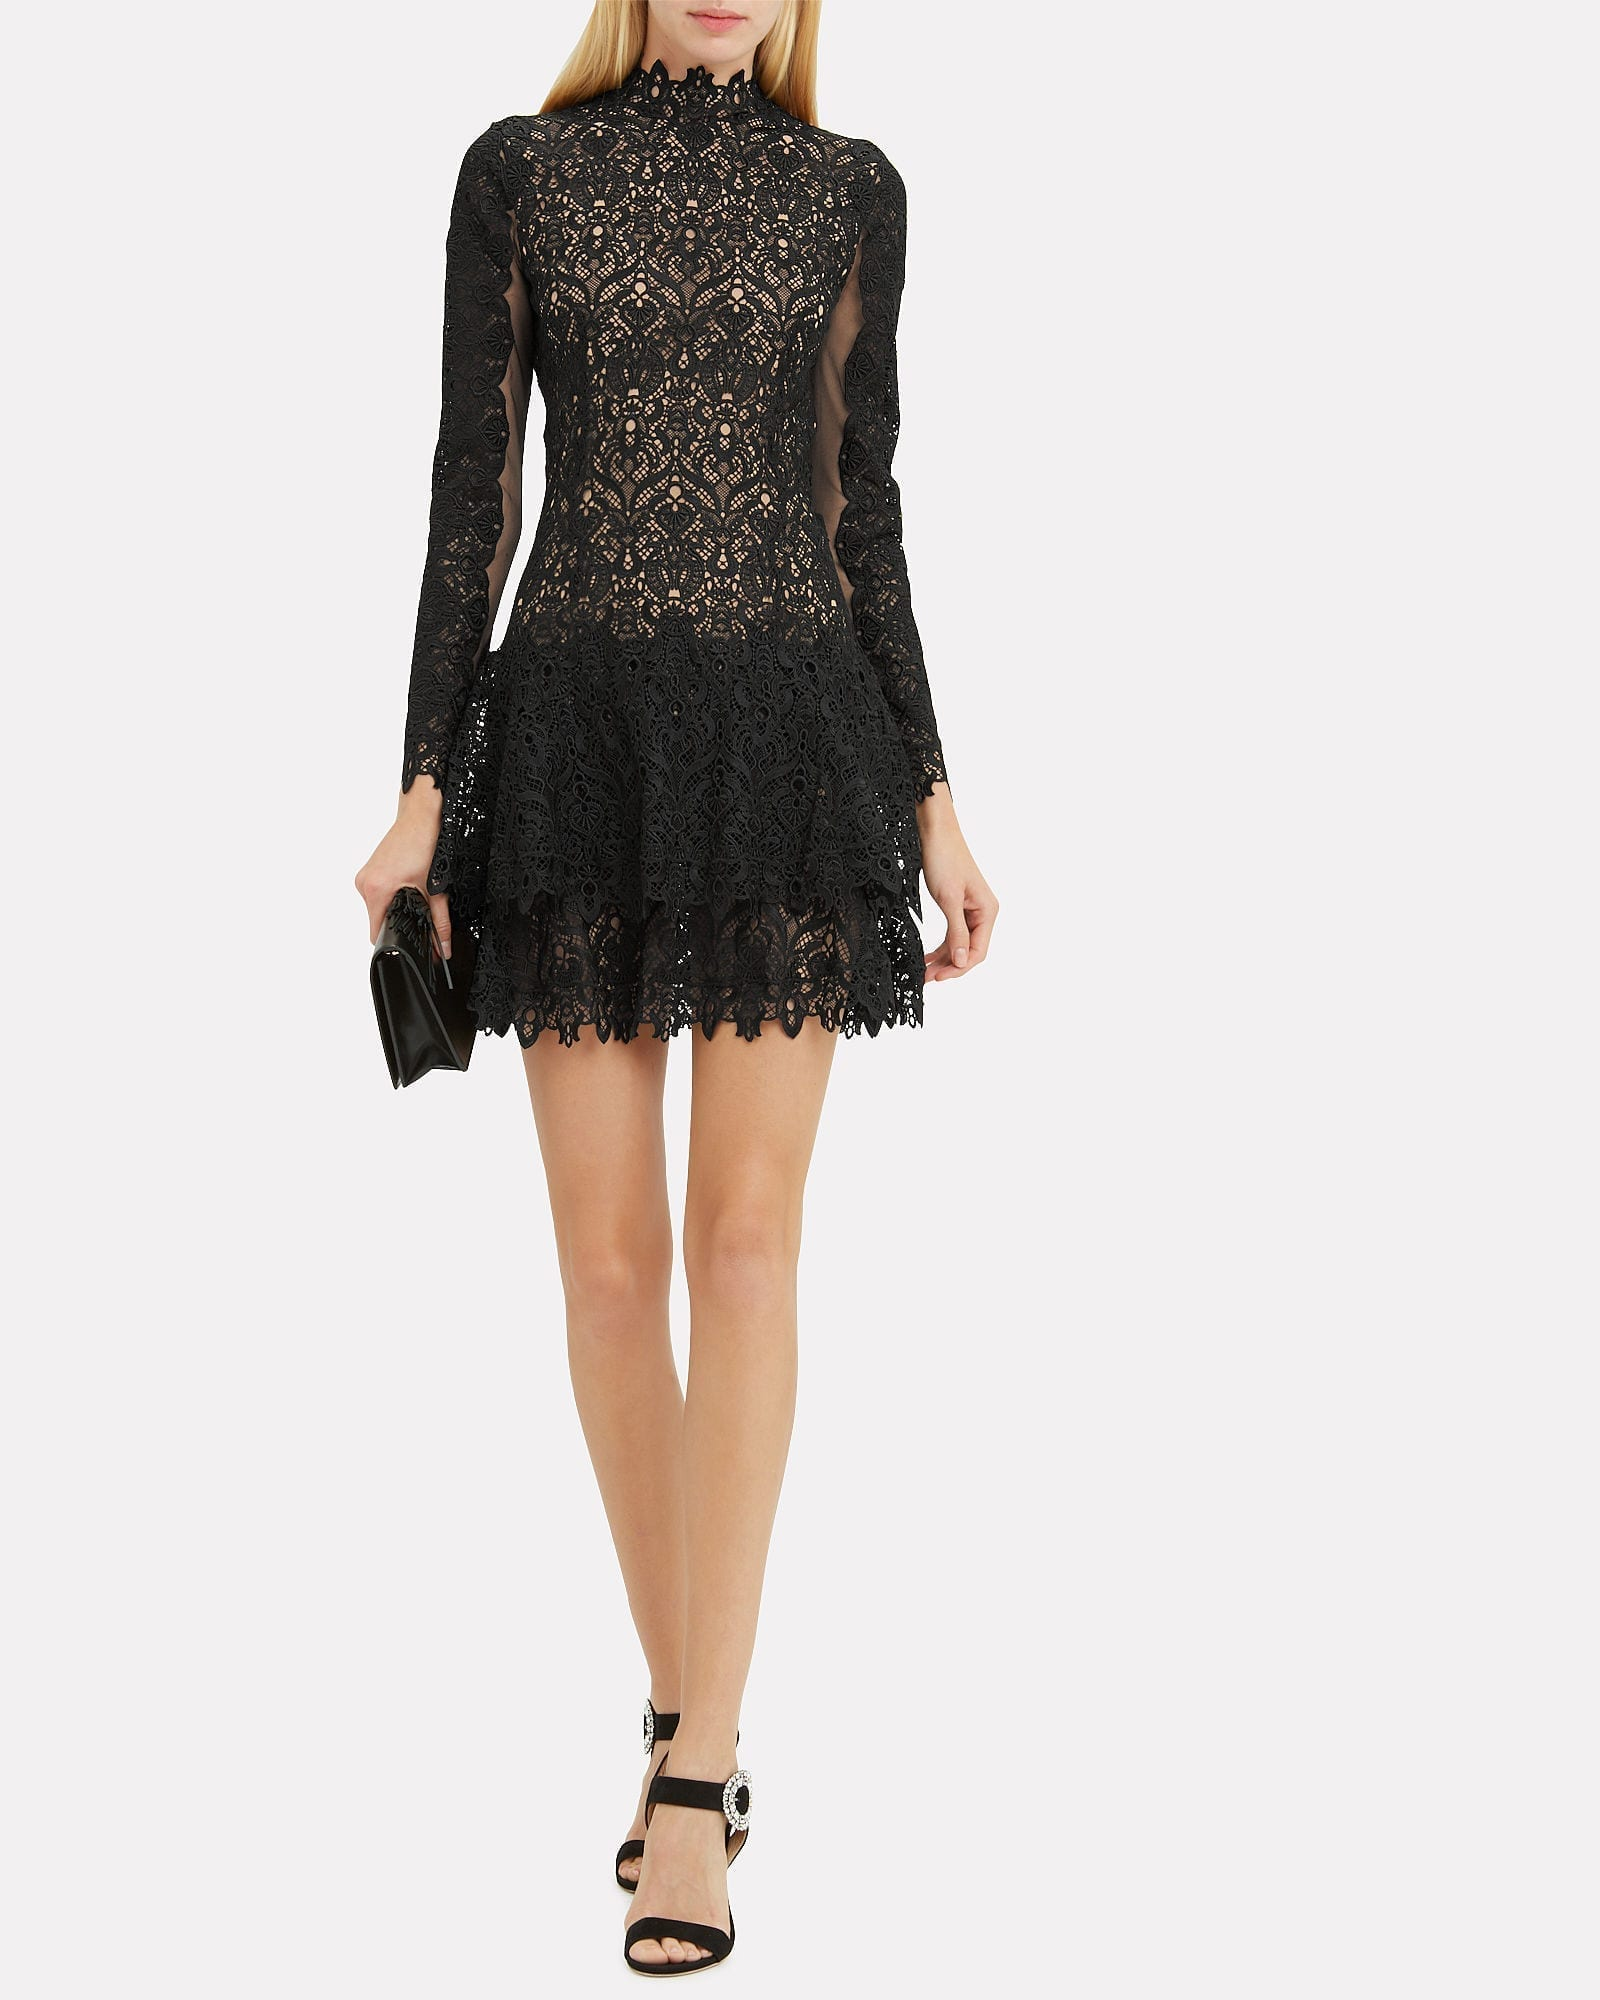 JONATHAN SIMKHAI Guipure Lace Mock Neck Black Dress